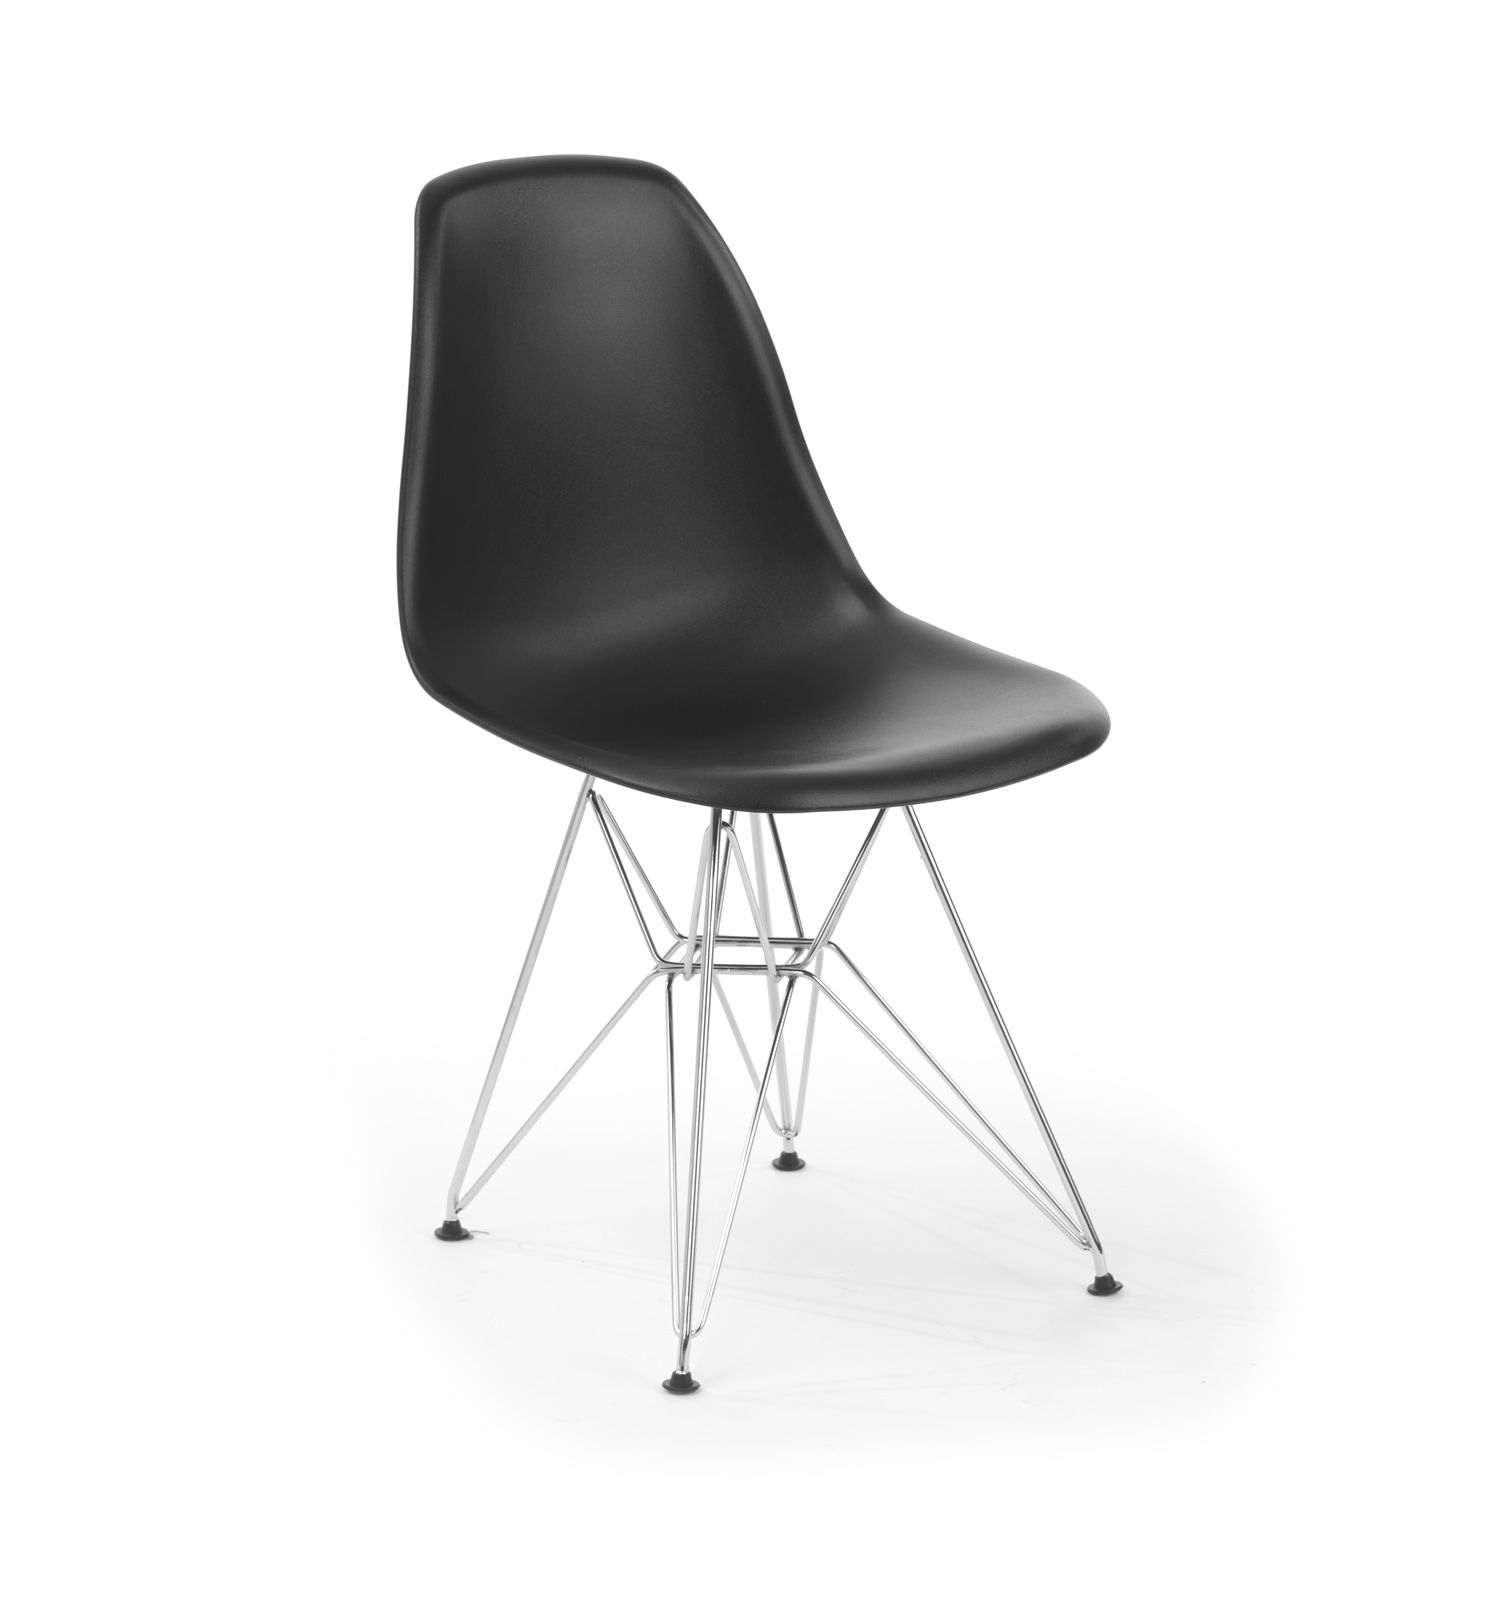 Eames Plastic Side Chair Dsr eames plastic side chair dsr black furniture side